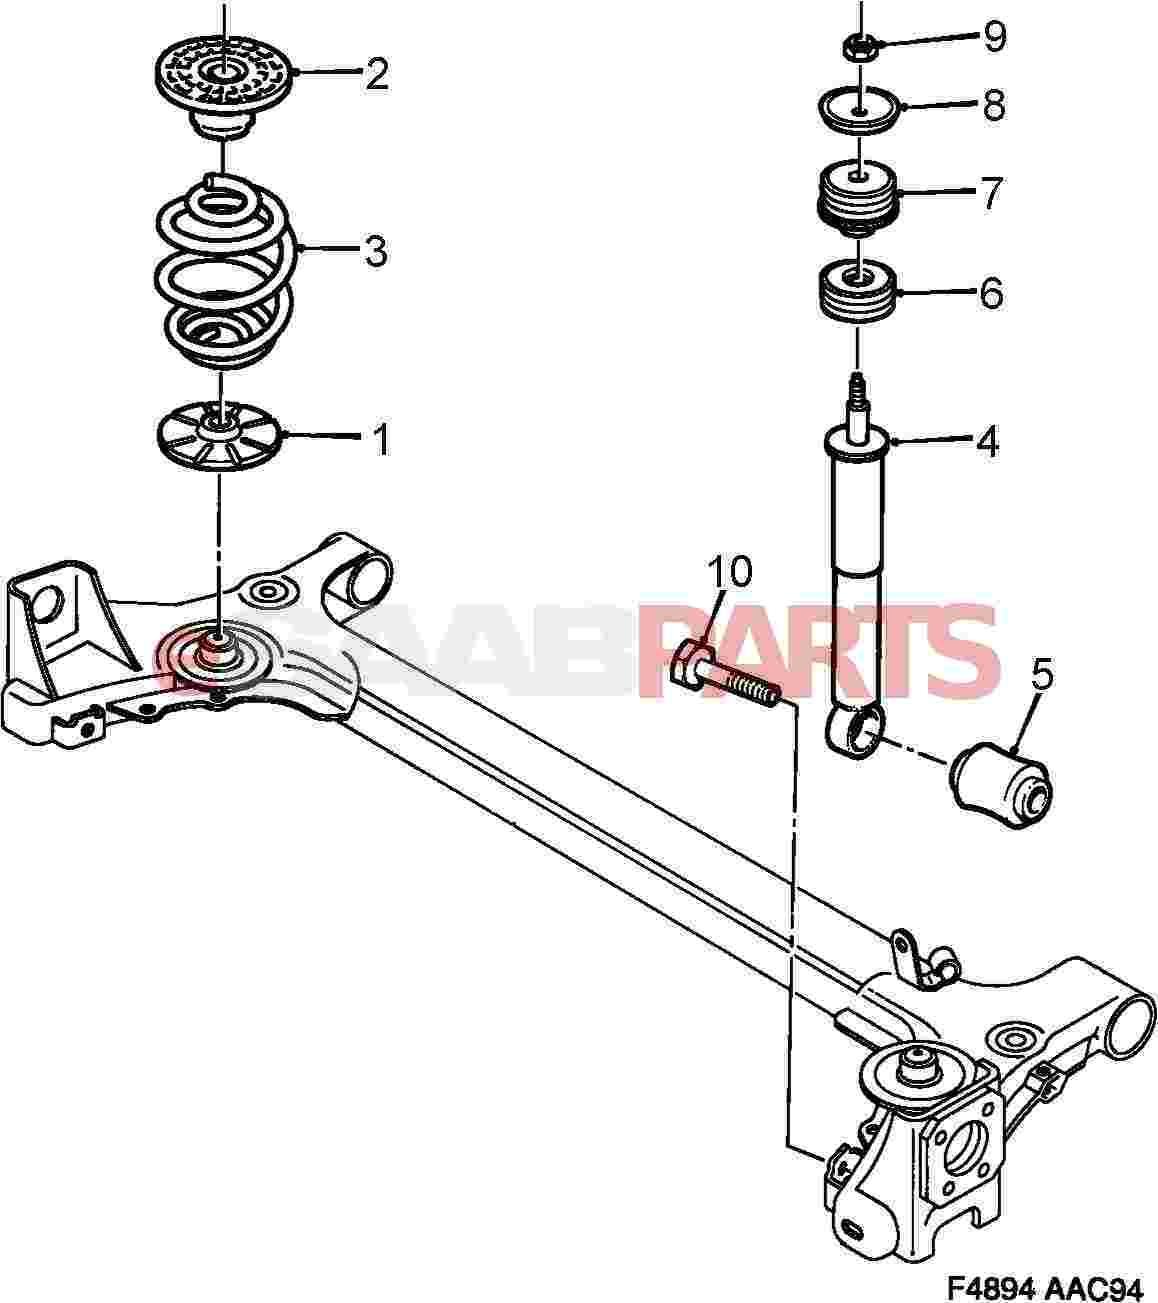 4244505 further Saab 900 Vacuum Diagram as well Viewparts further Saab Engine Diagram further . on 2003 saab 9 3 turbo rear suspension